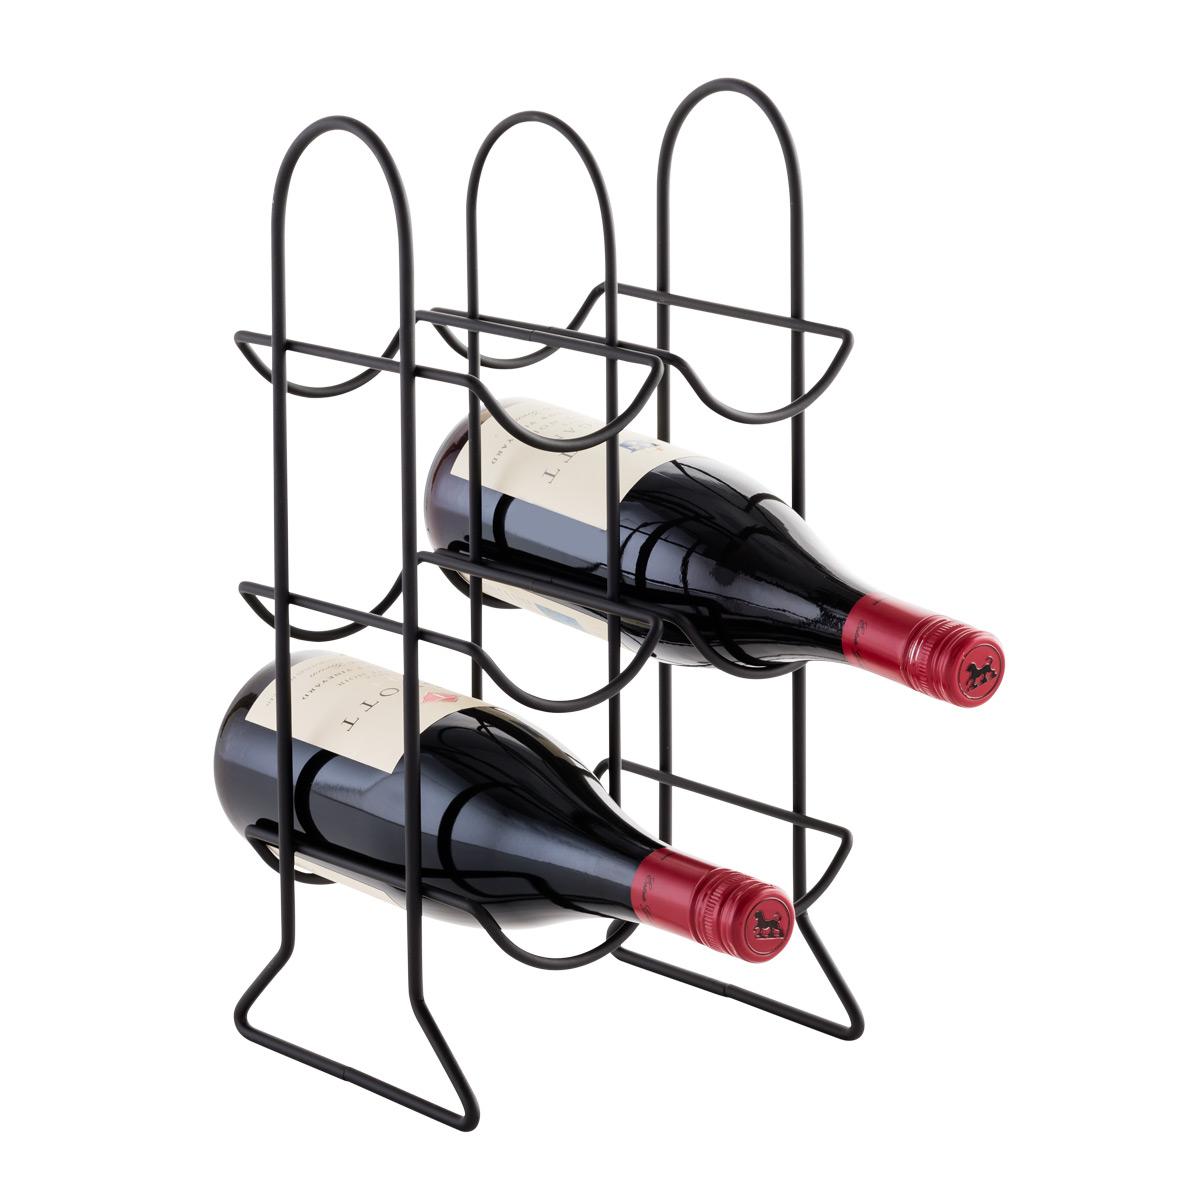 6-Bottle Wine Rack